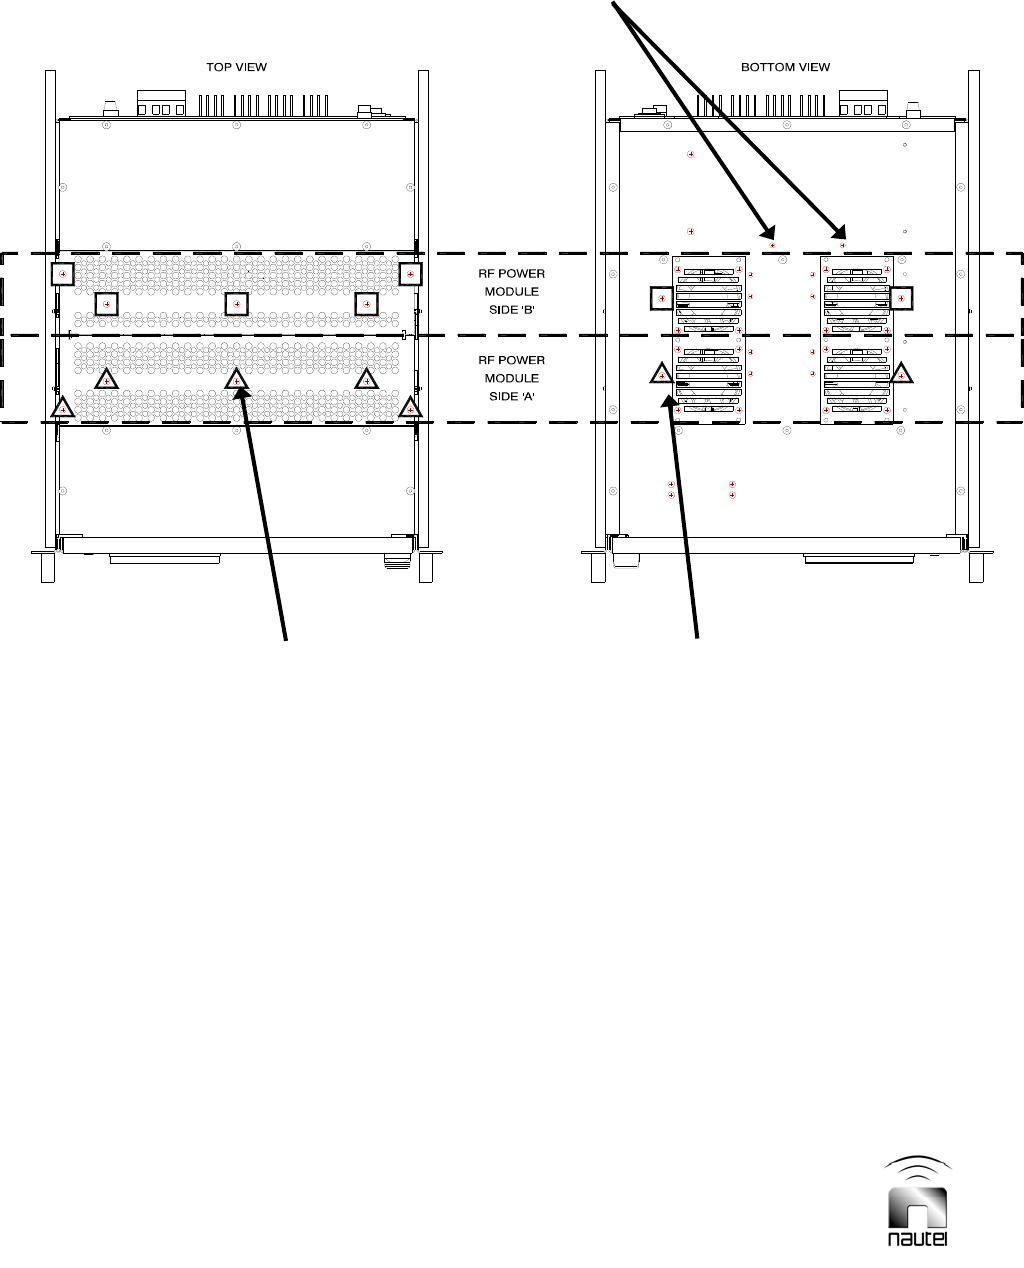 Nautel Maine Vector125 Vr125 User Manual Radiosparkscomschematics Indexoscillators11 2 2016 Page 5 10 Vector Lp Radio Beacon Transmitter Technical Instruction